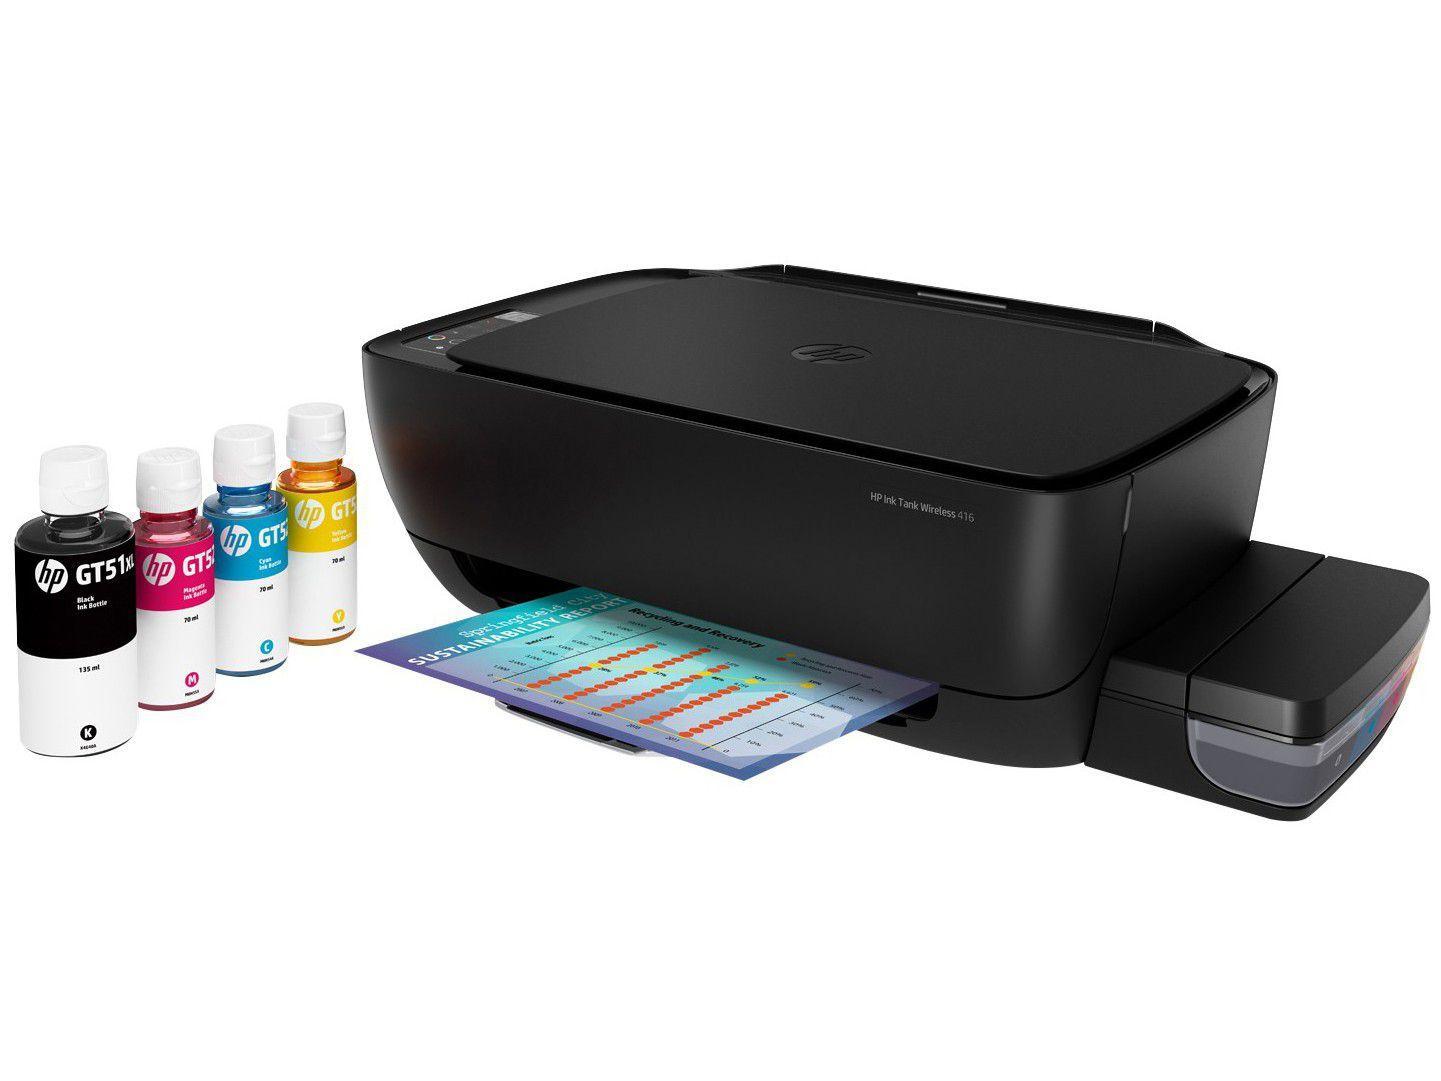 Impressora Multifuncional HP Ink Tank Wi-Fi 416 - Tanque de Tinta Wireless Colorida USB